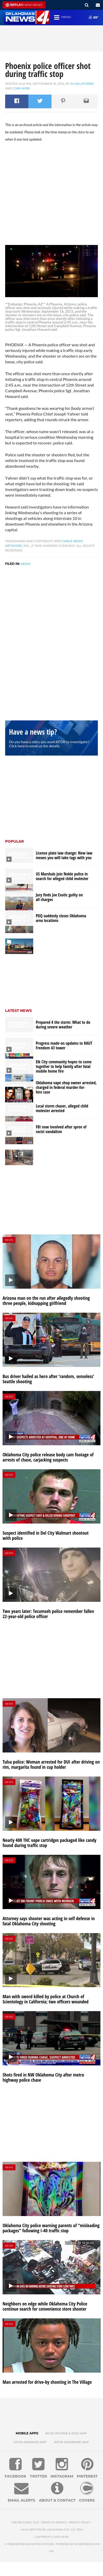 Incident | Gun Violence Archive